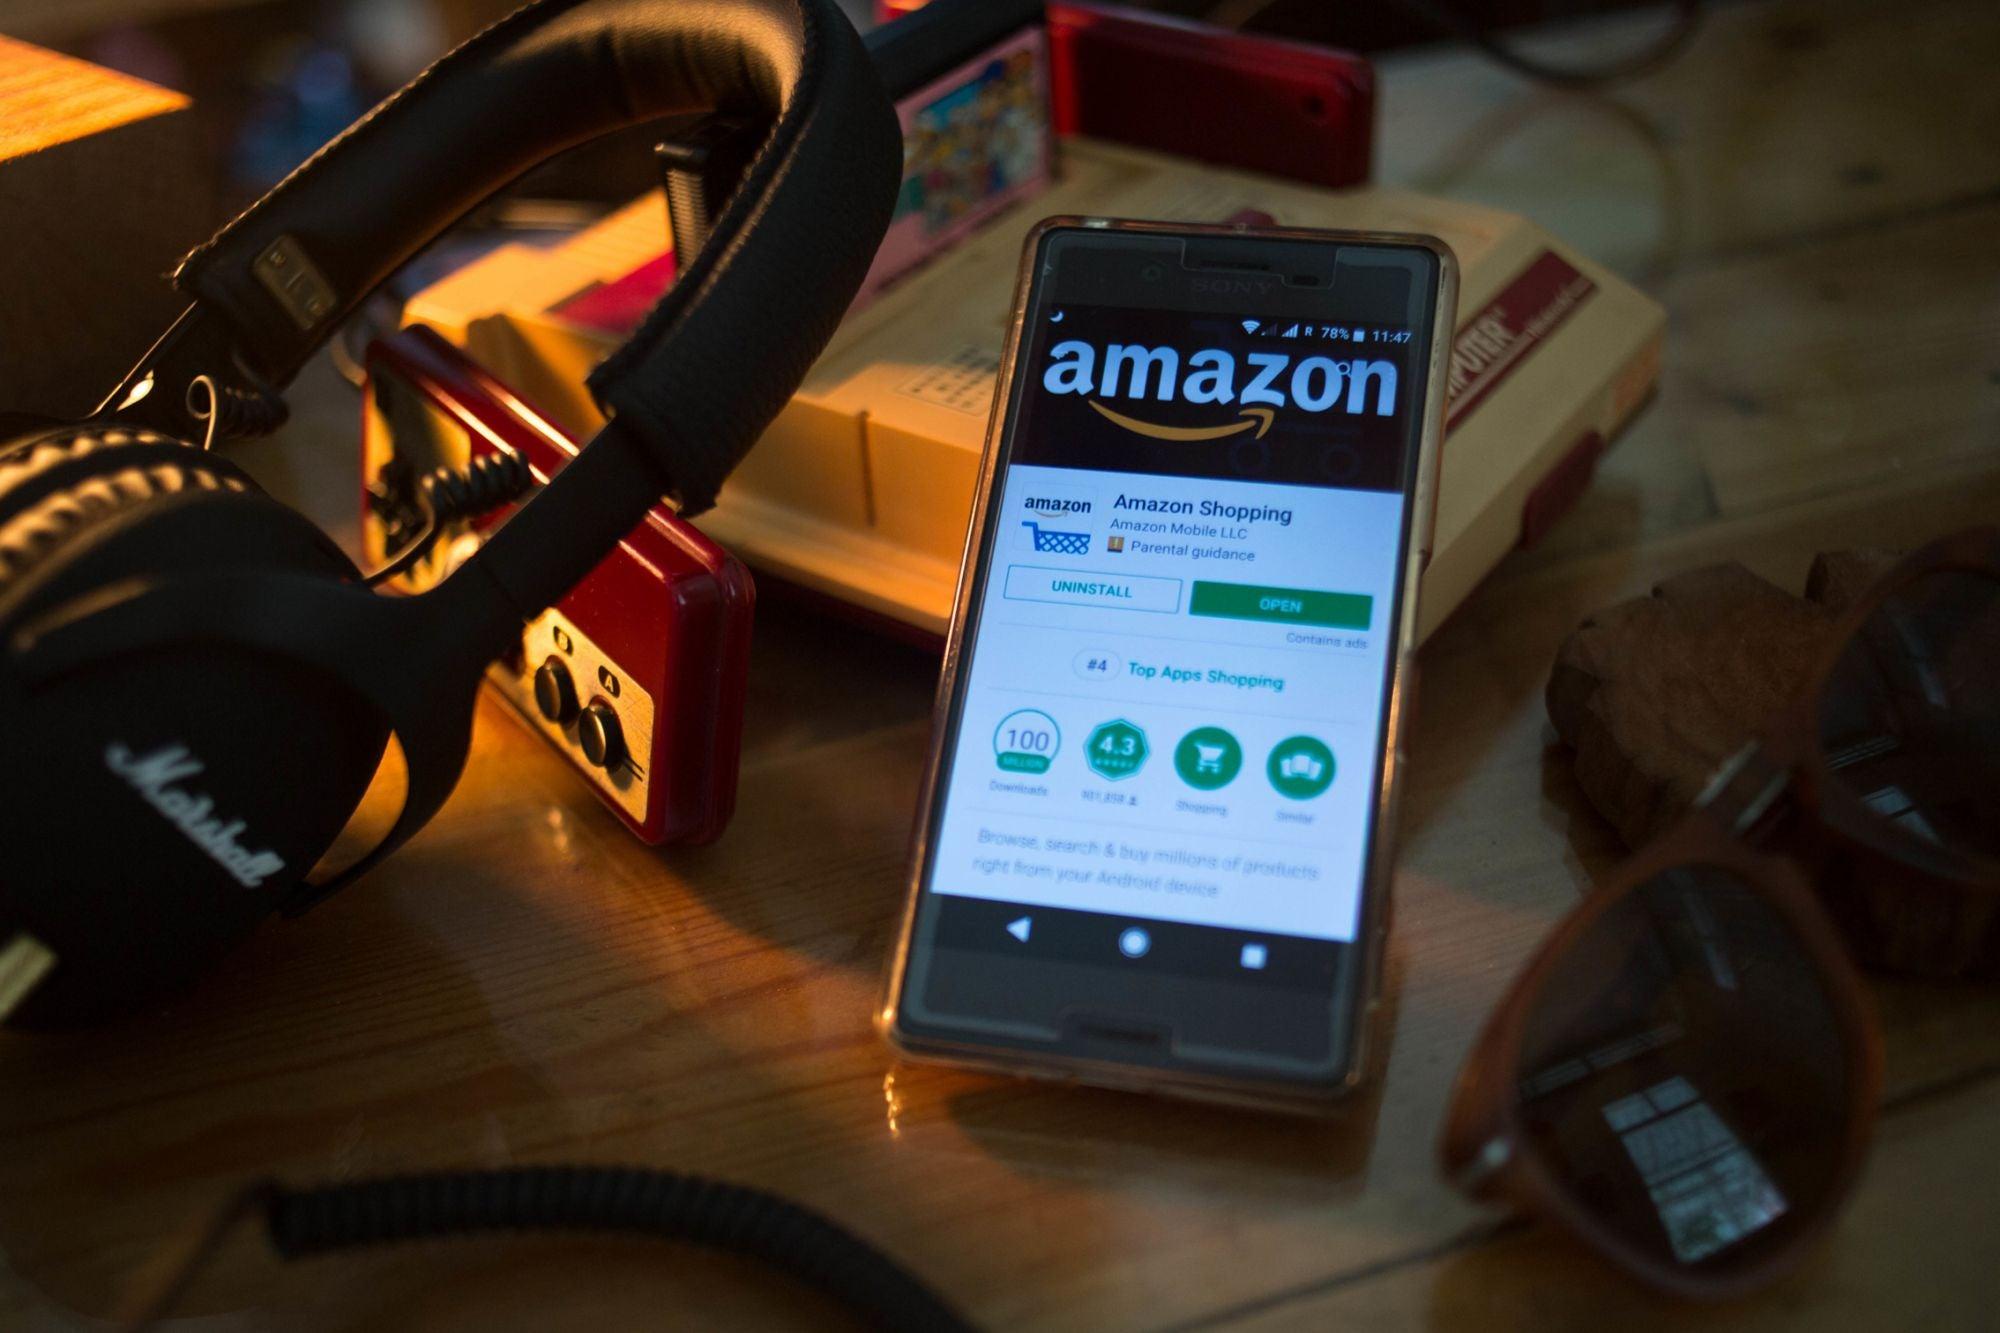 Tech Giants Alphabet Inc. and Amazon.com Both Up Over $20 Per Share